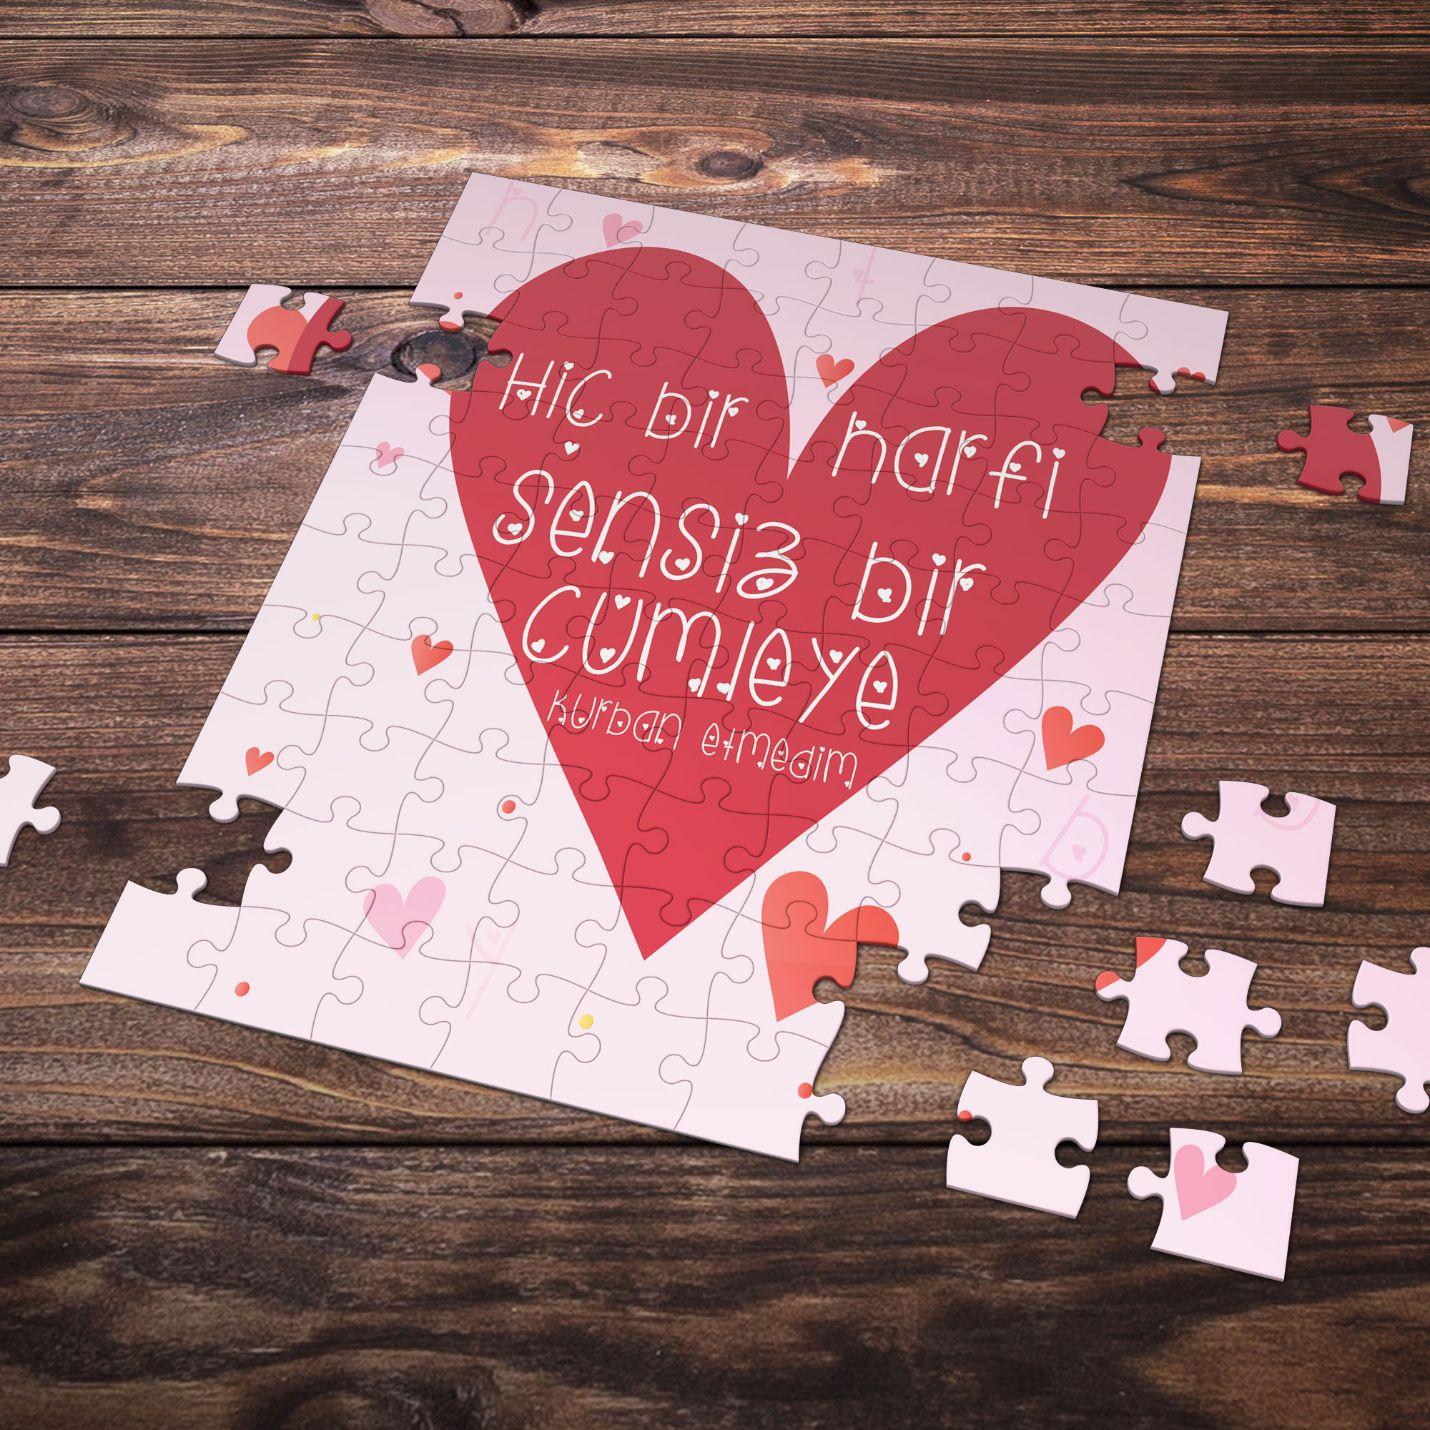 99 Parça Romantik Tasarımlı Puzzle Yapboz No4